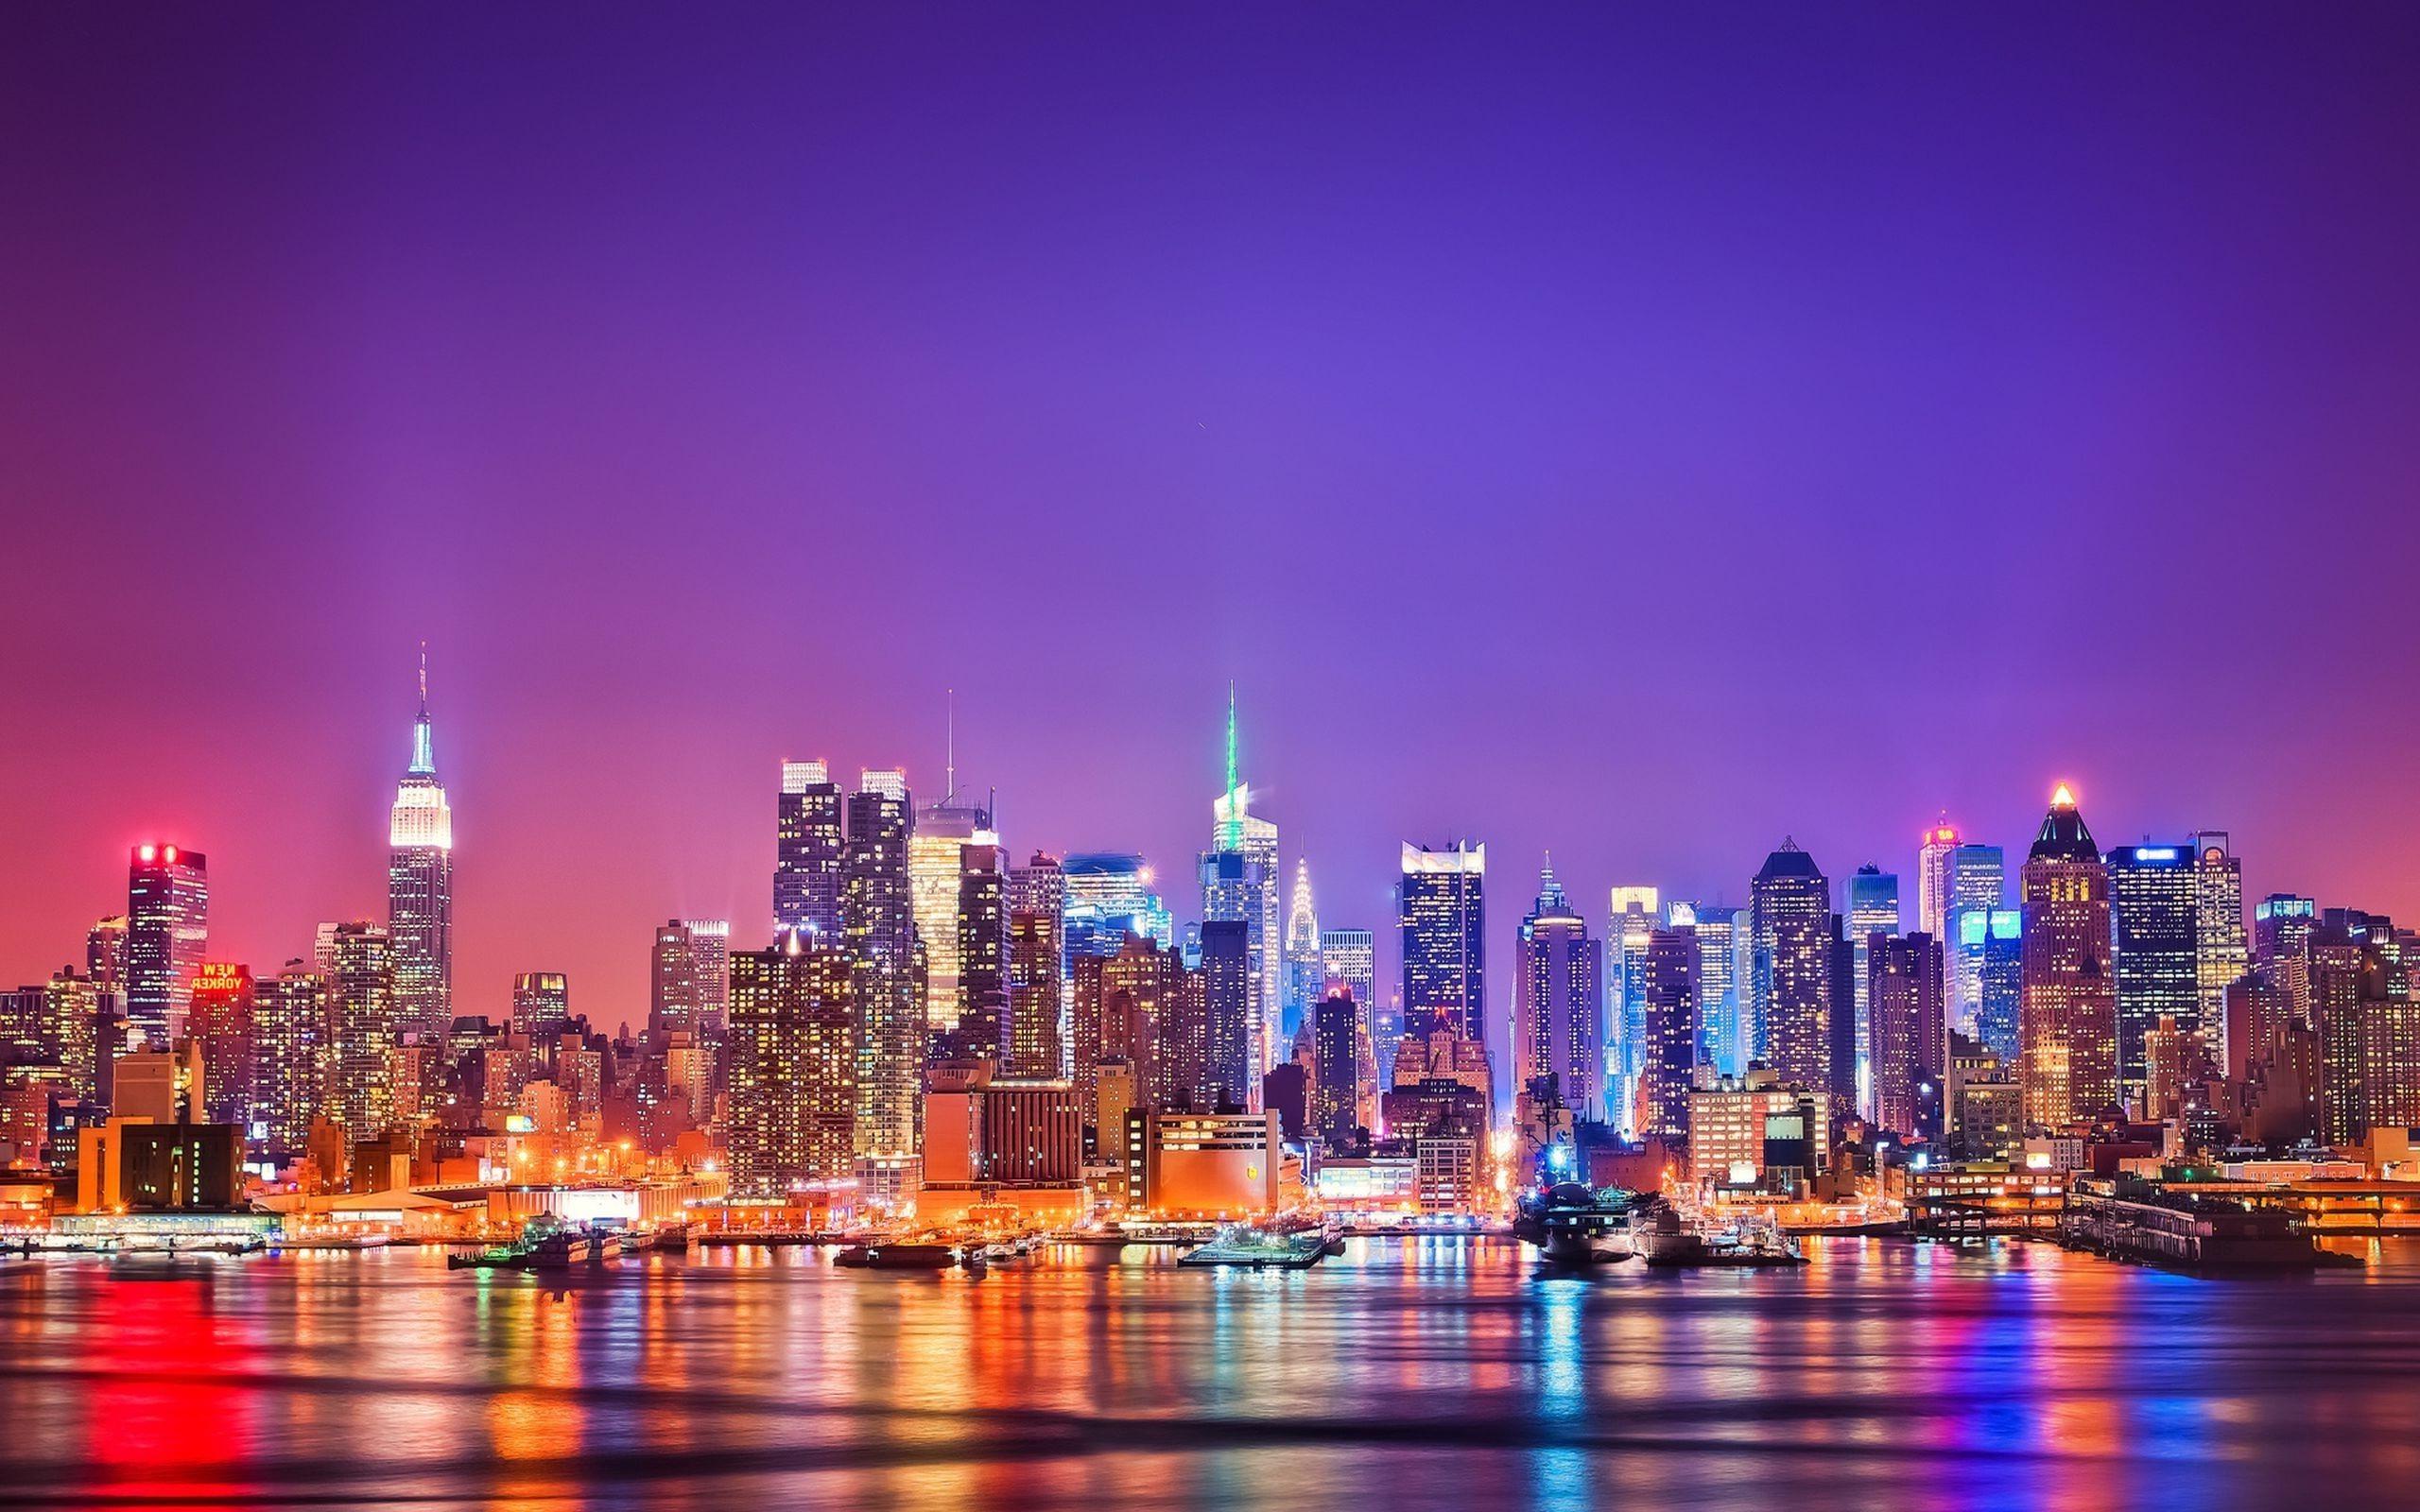 City Skyline Background (60+ images)